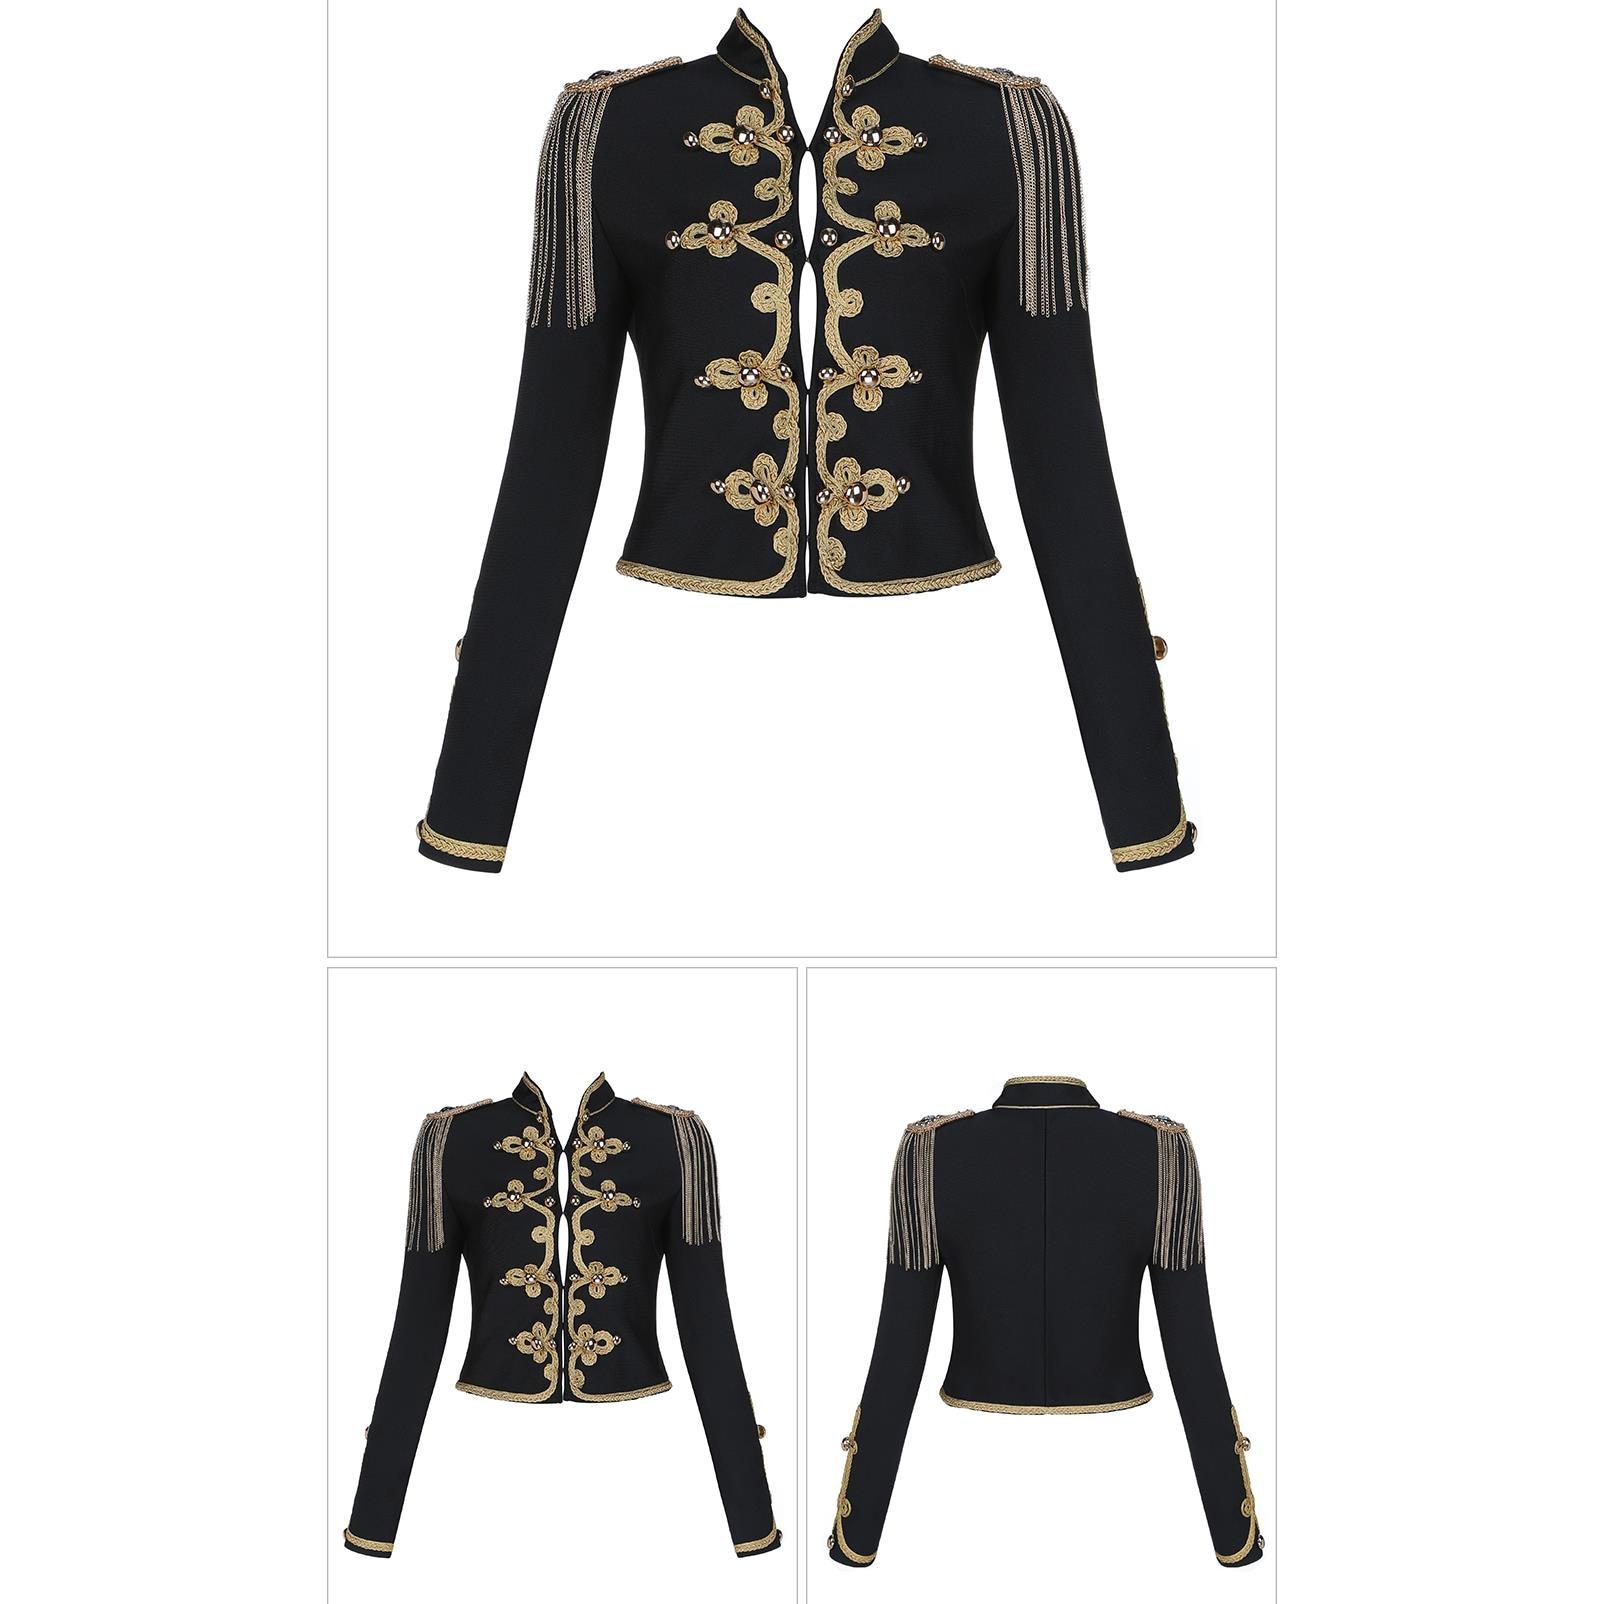 Chaqueta corta Retro mujer ropa Empire 2019 Otoño Invierno Lady Jacket Coat - 6